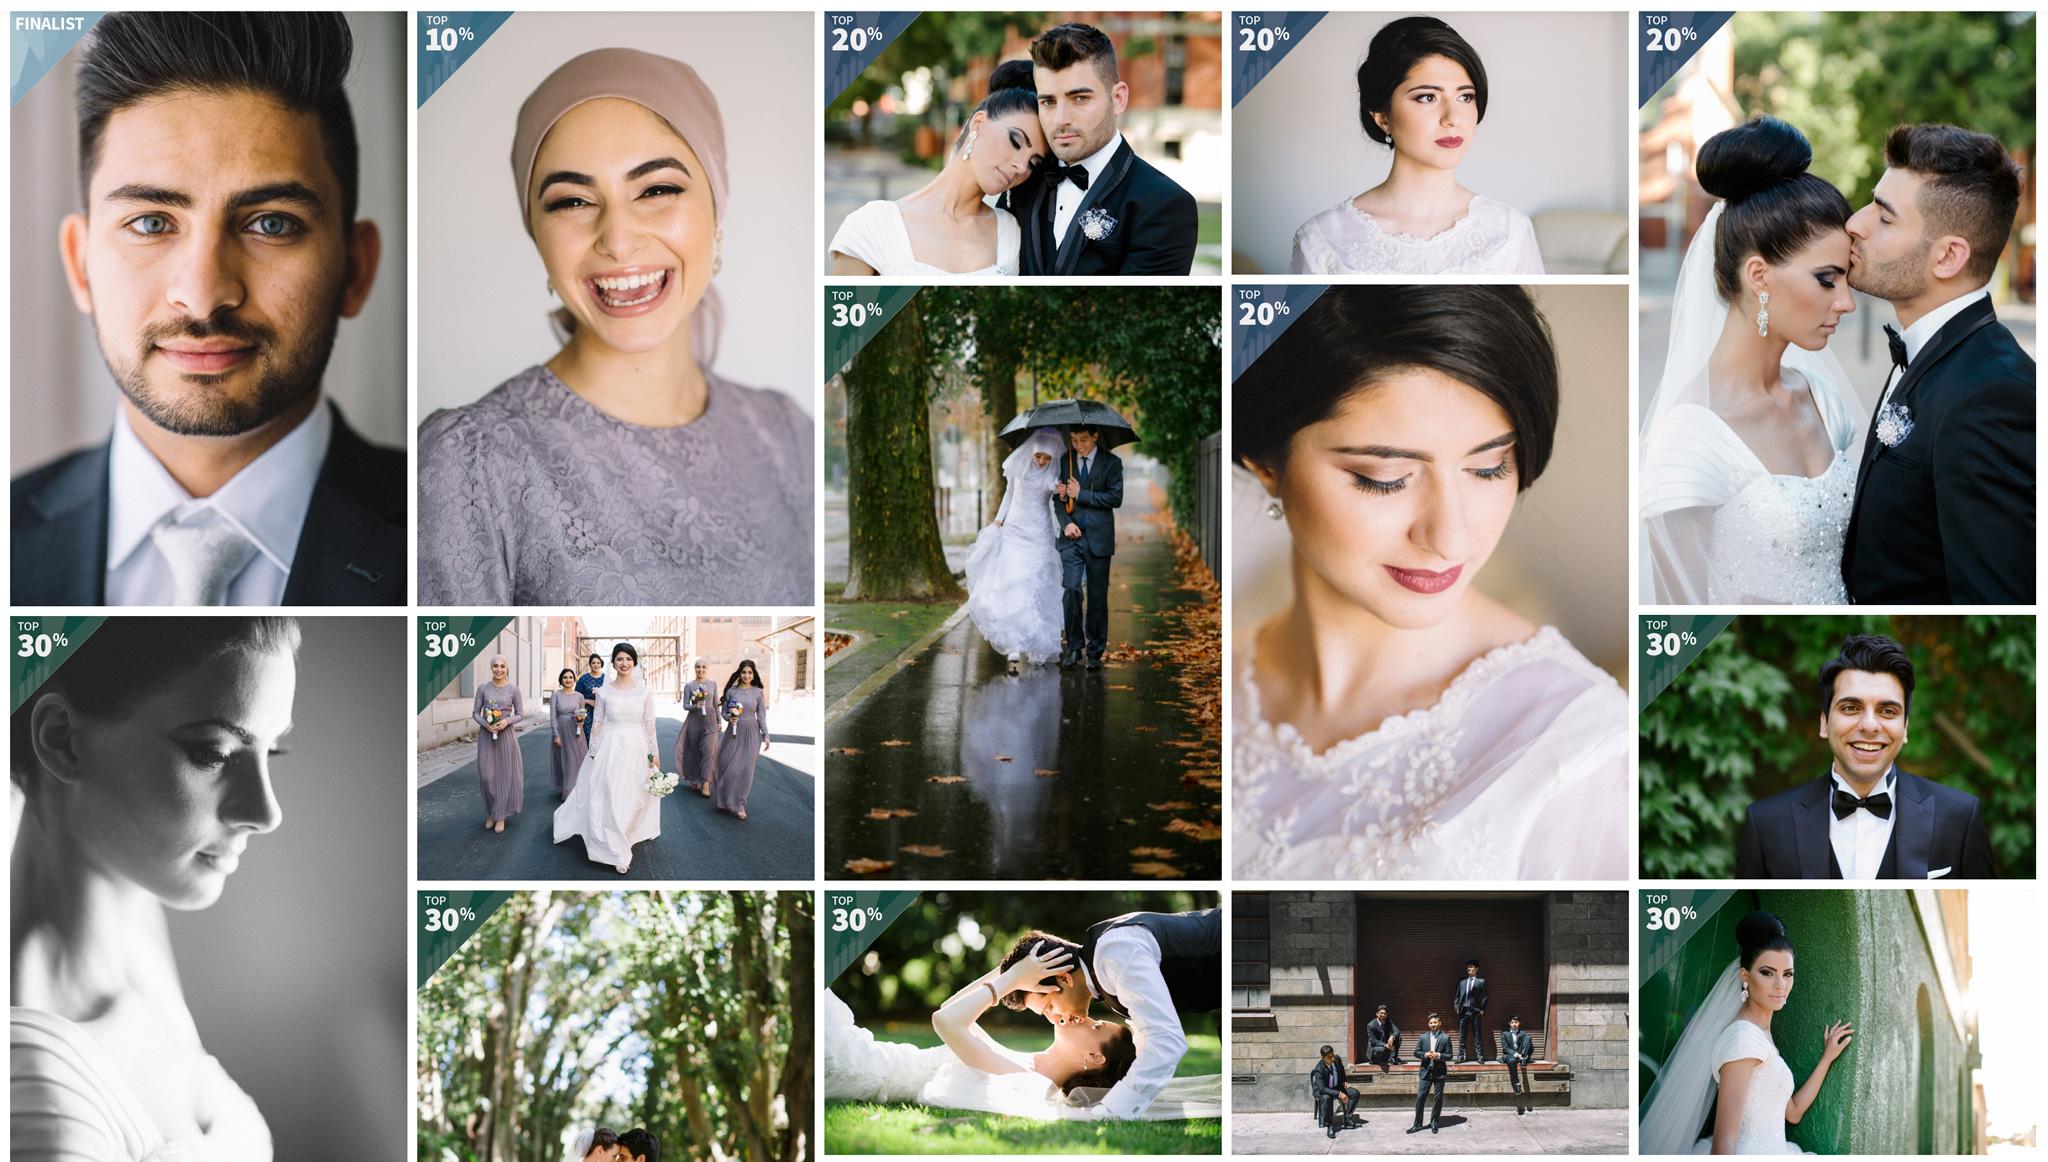 Shoot & Share Photo Contest 2015